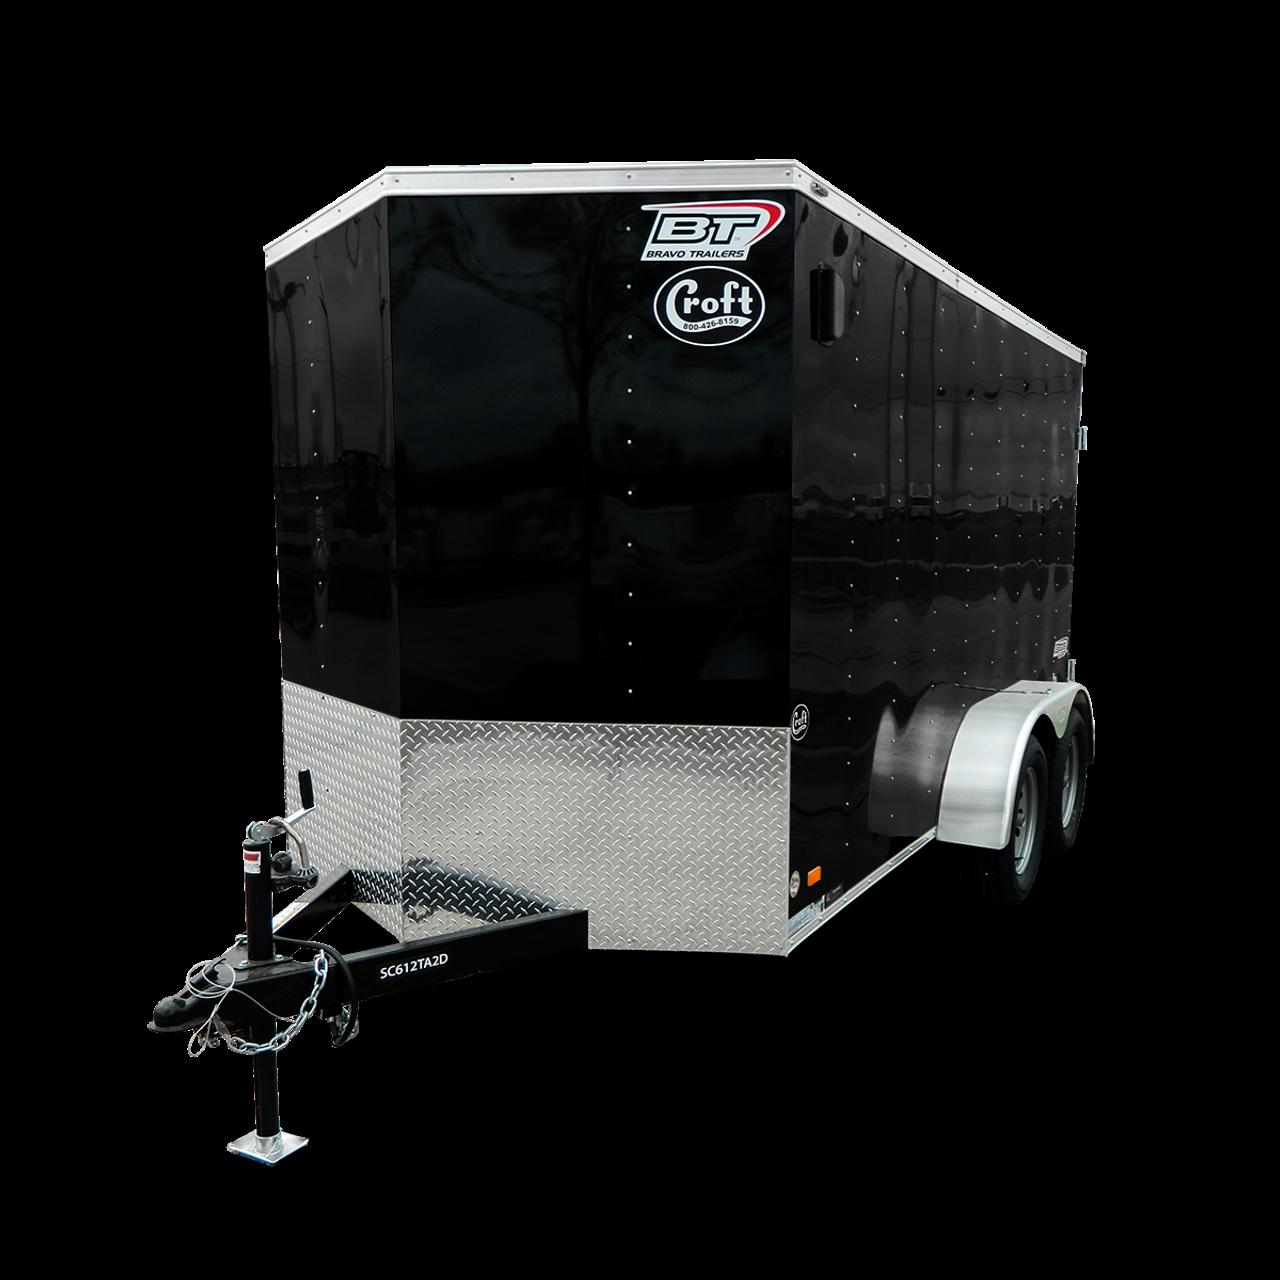 SC714TA2DRD --- 7' X 14' Enclosed Tandem Trailer with Ramp Door - Bravo